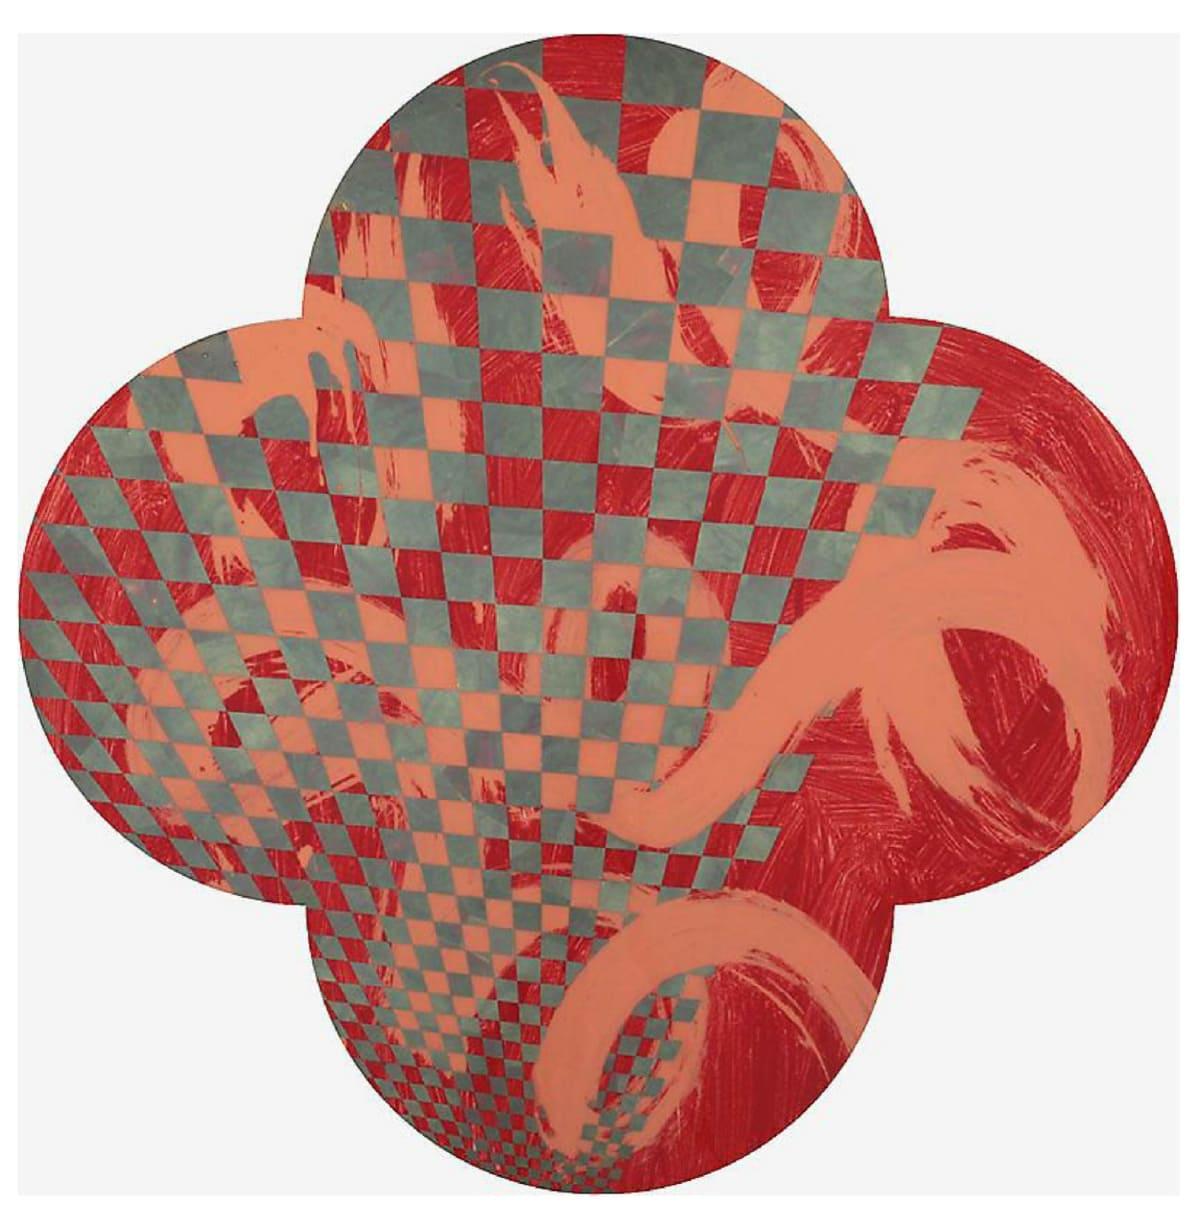 Max GIMBLETT Pegasus, 2016 Mixed media 40 x 40 in 101.6 x 101.6 cm